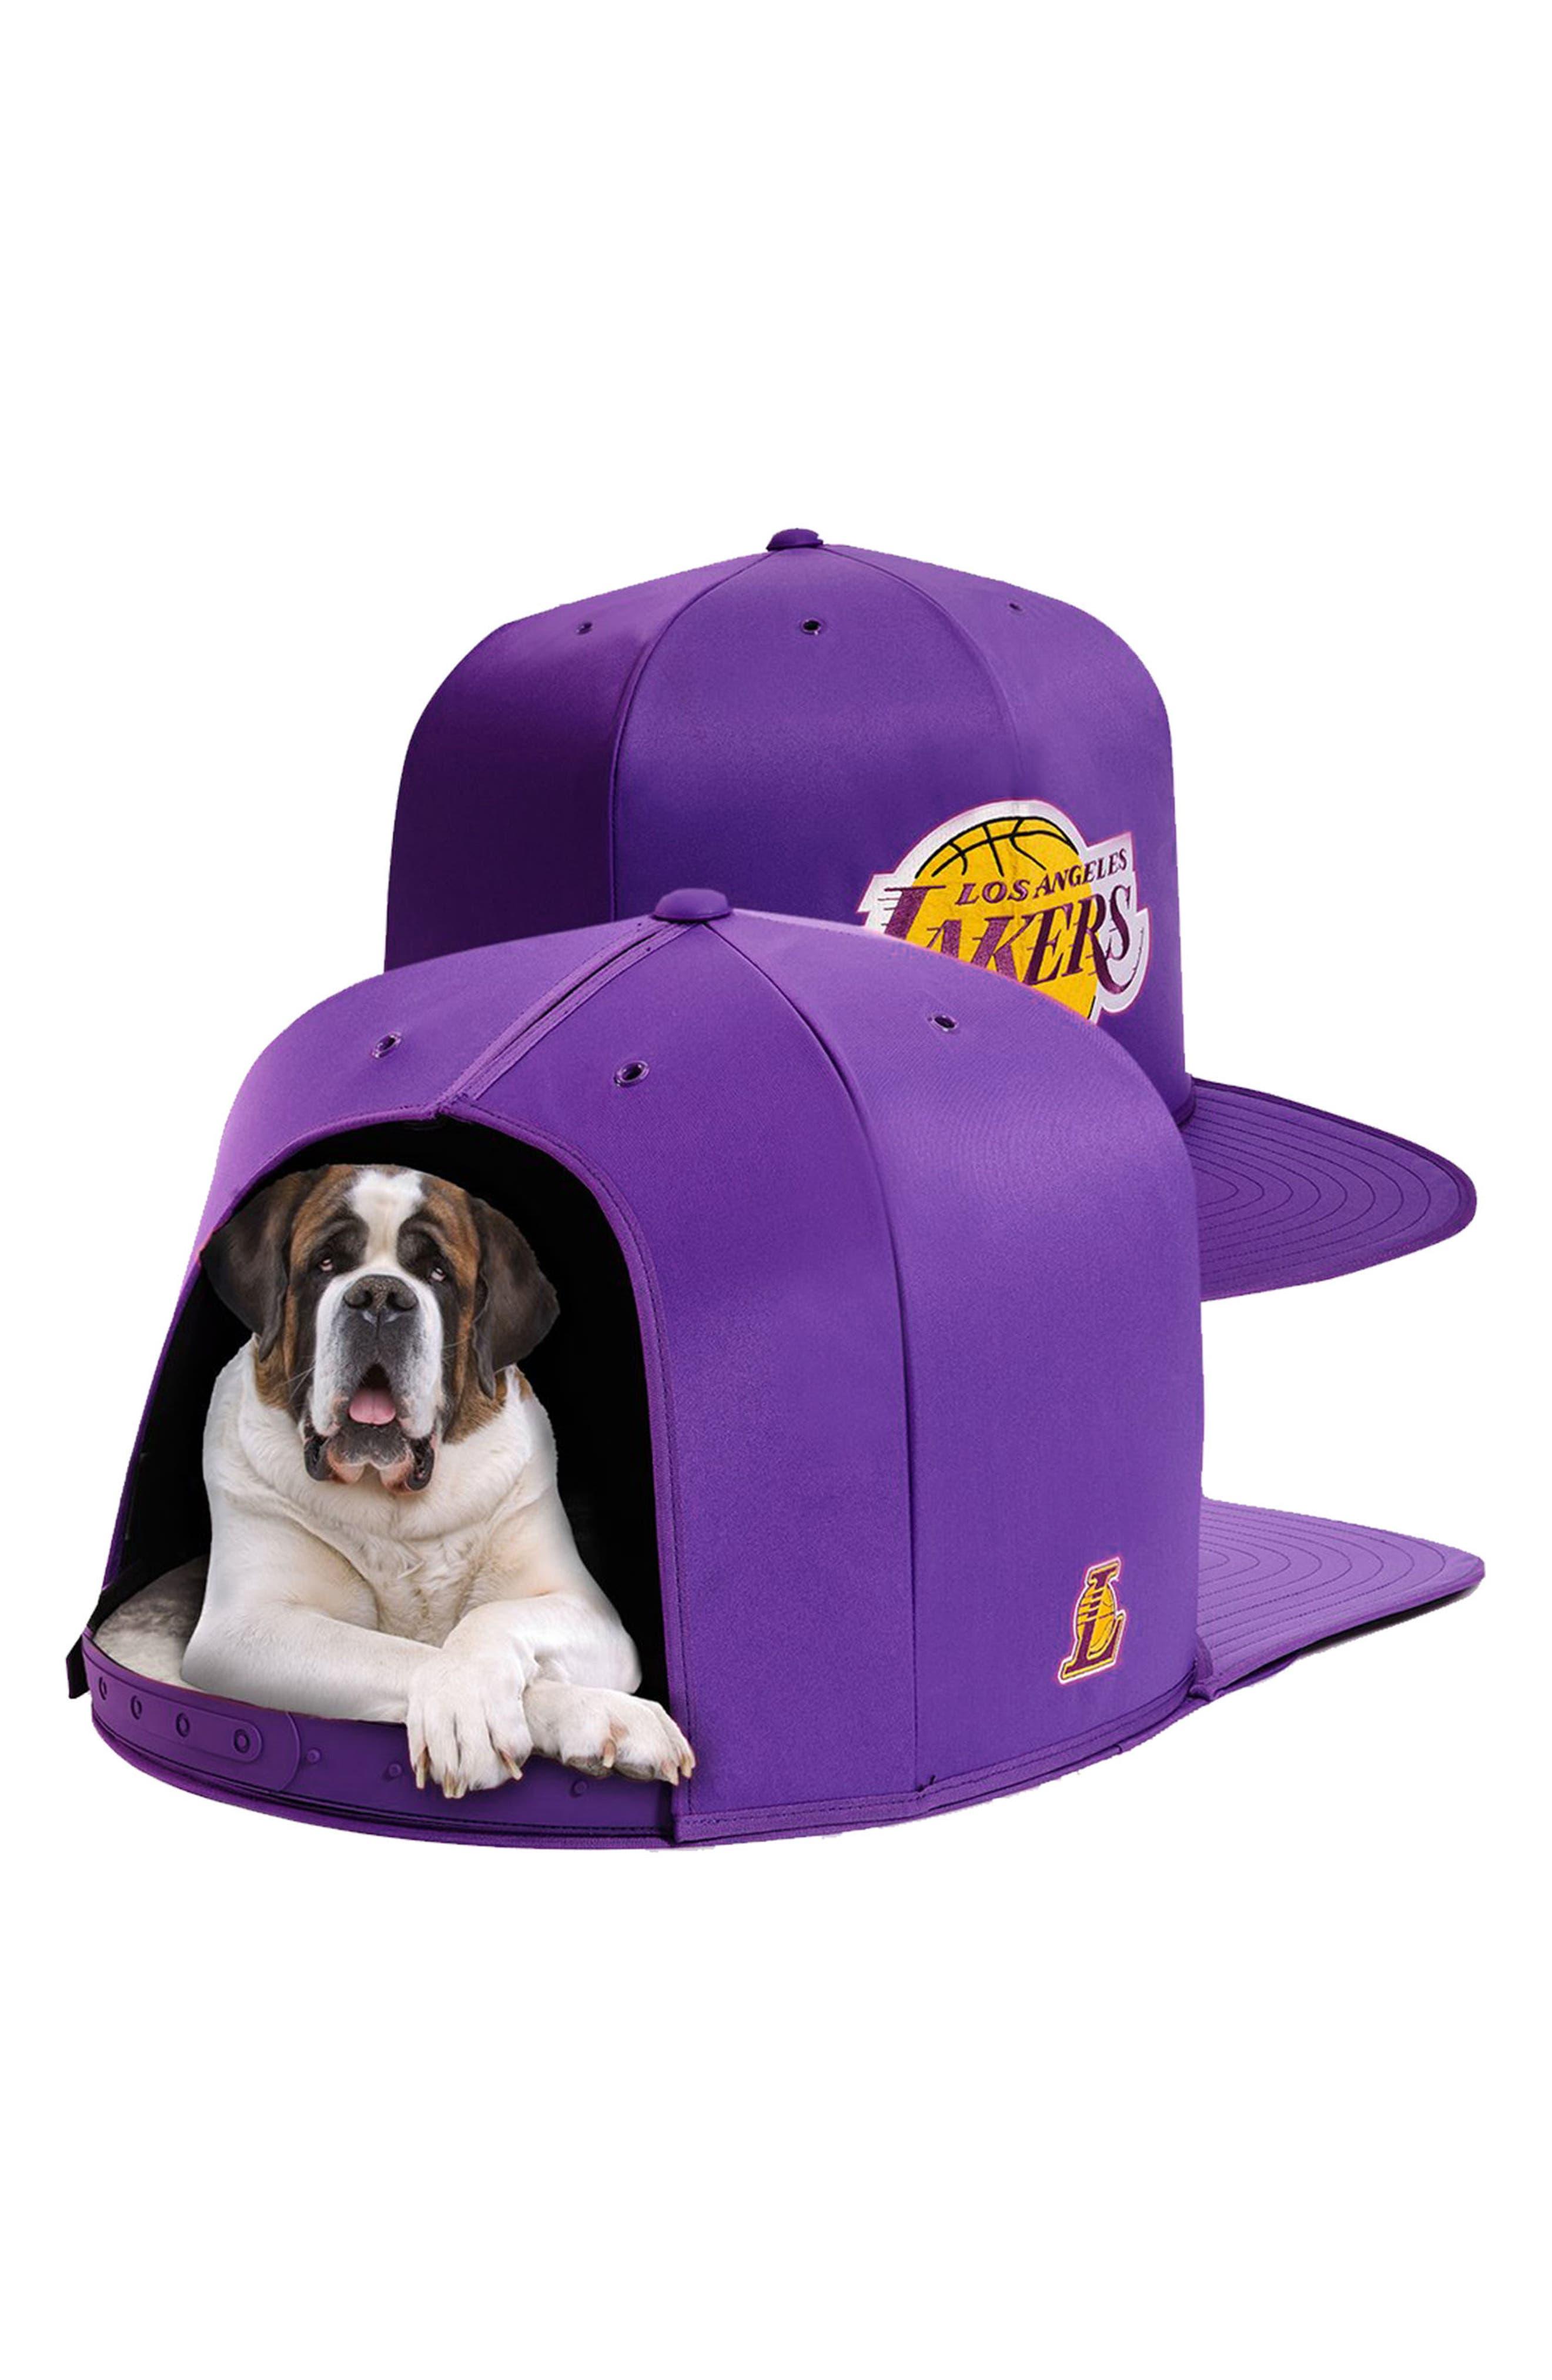 Los Angeles Lakers Pet Bed,                             Alternate thumbnail 4, color,                             Purple